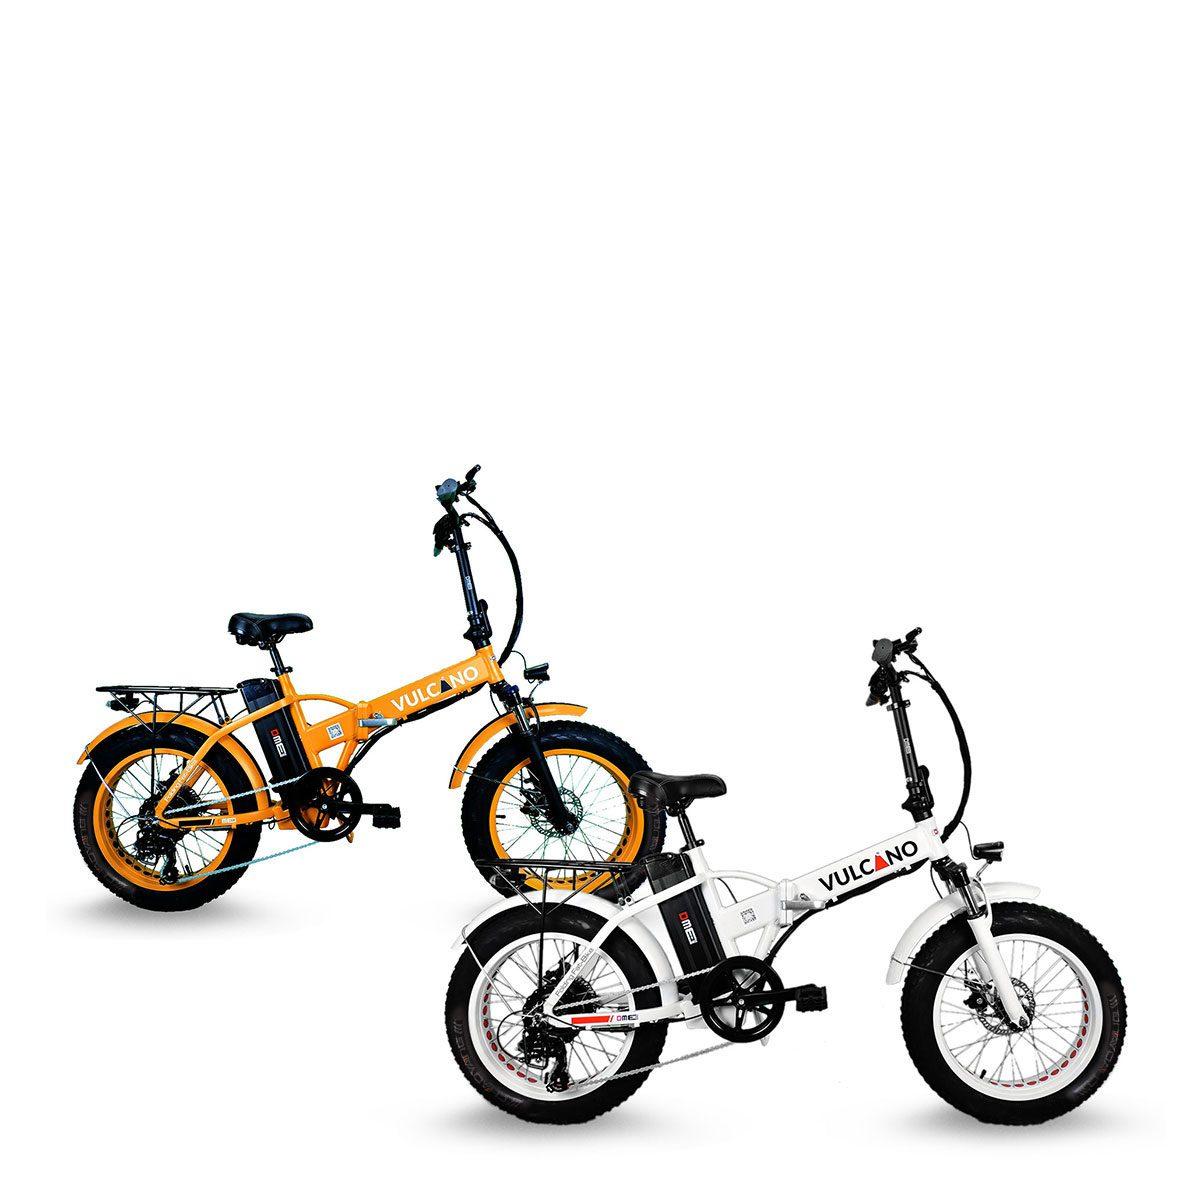 Vulcano V242 500w Fat Bike Dme Elettrica Bikeit